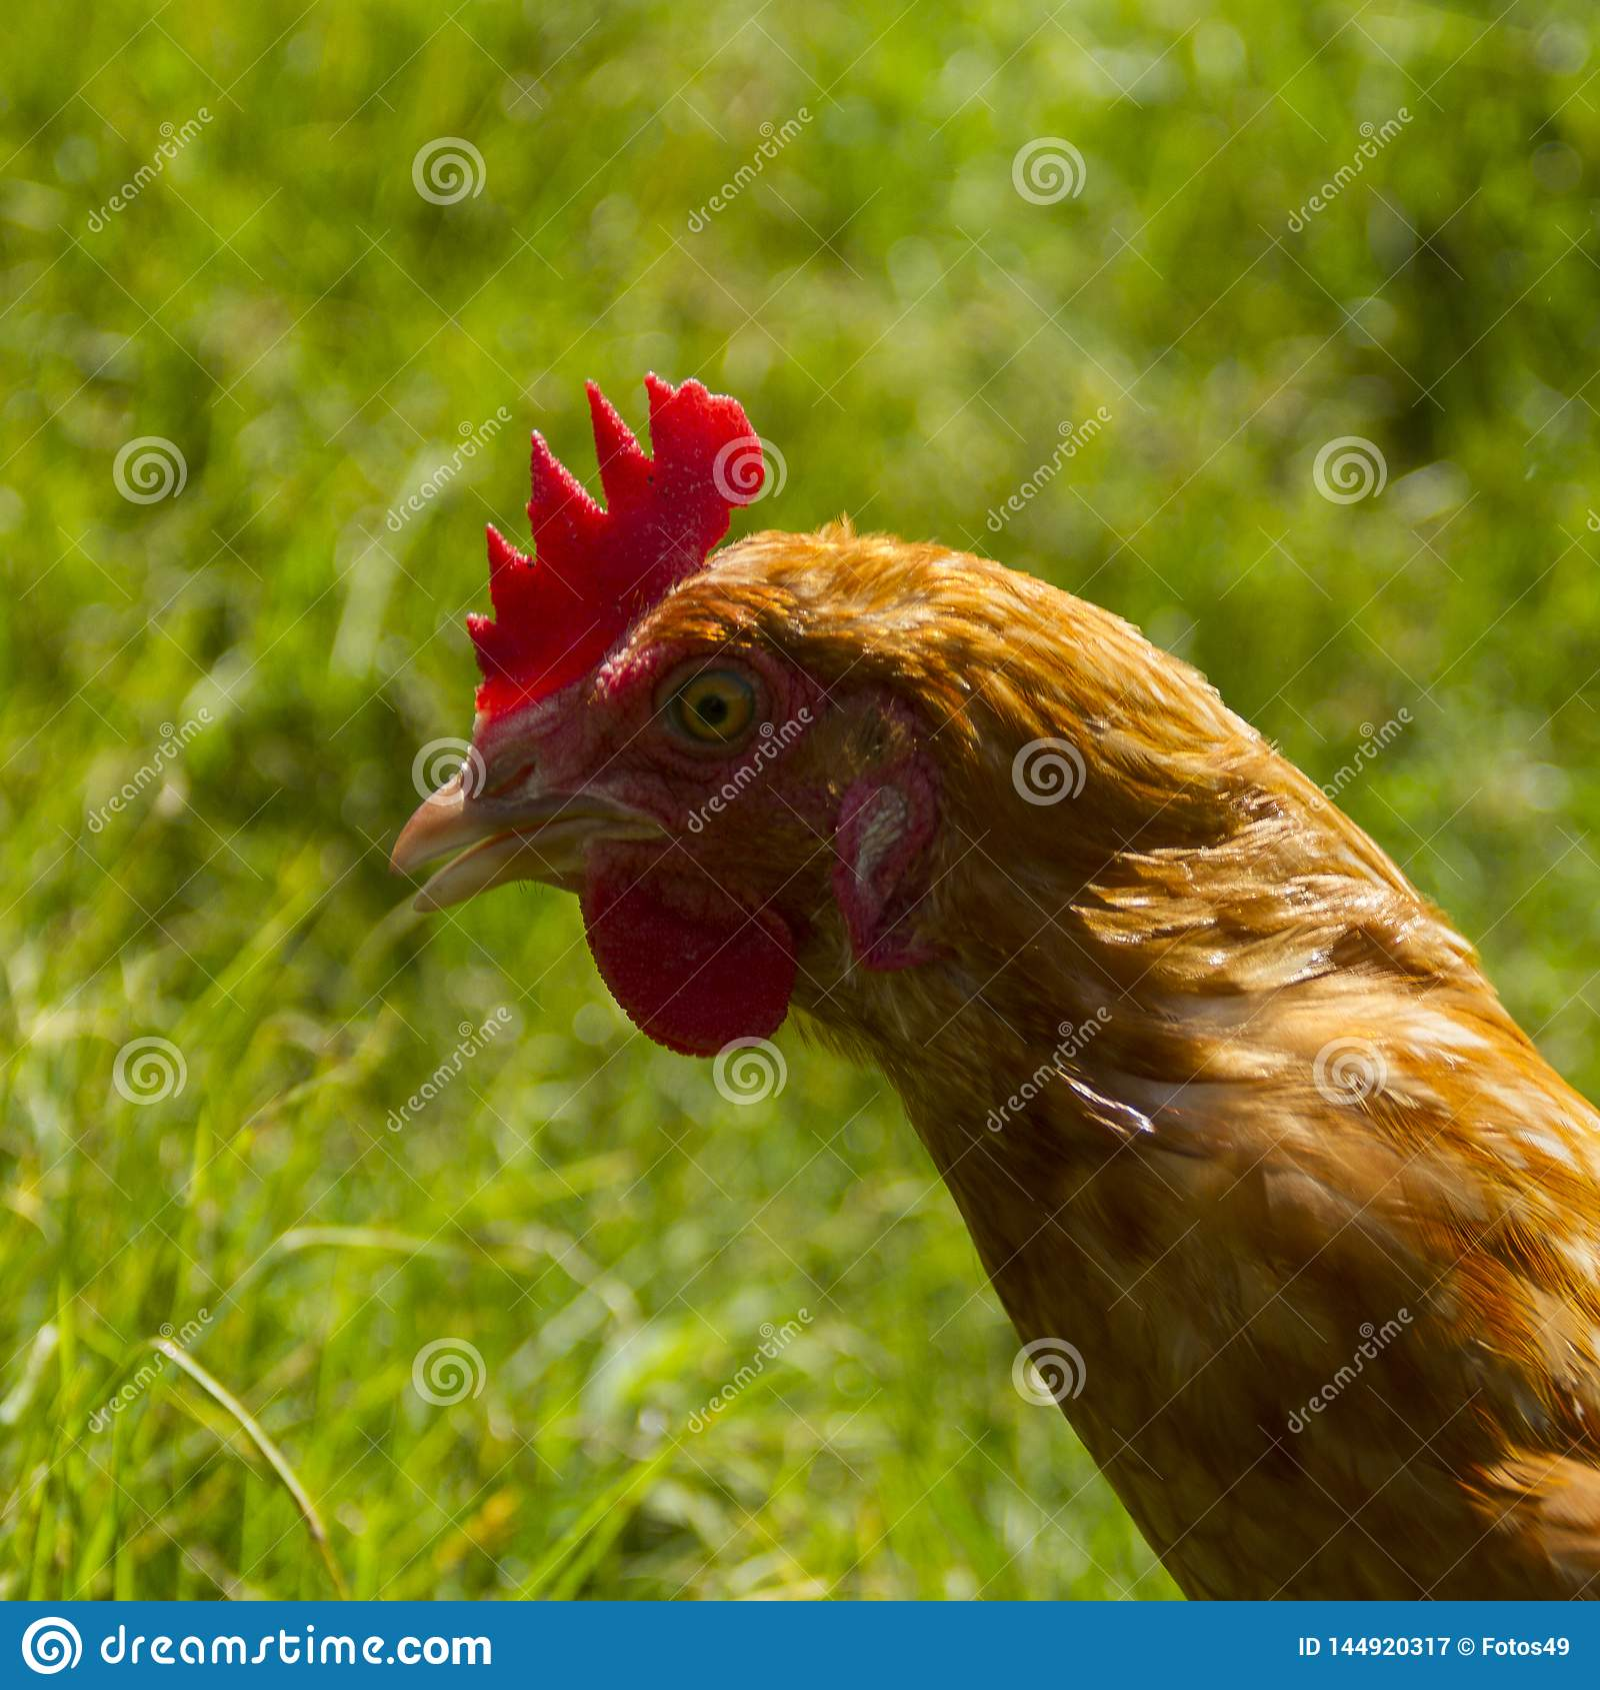 Free hens grazing organic eggs green grass sun day